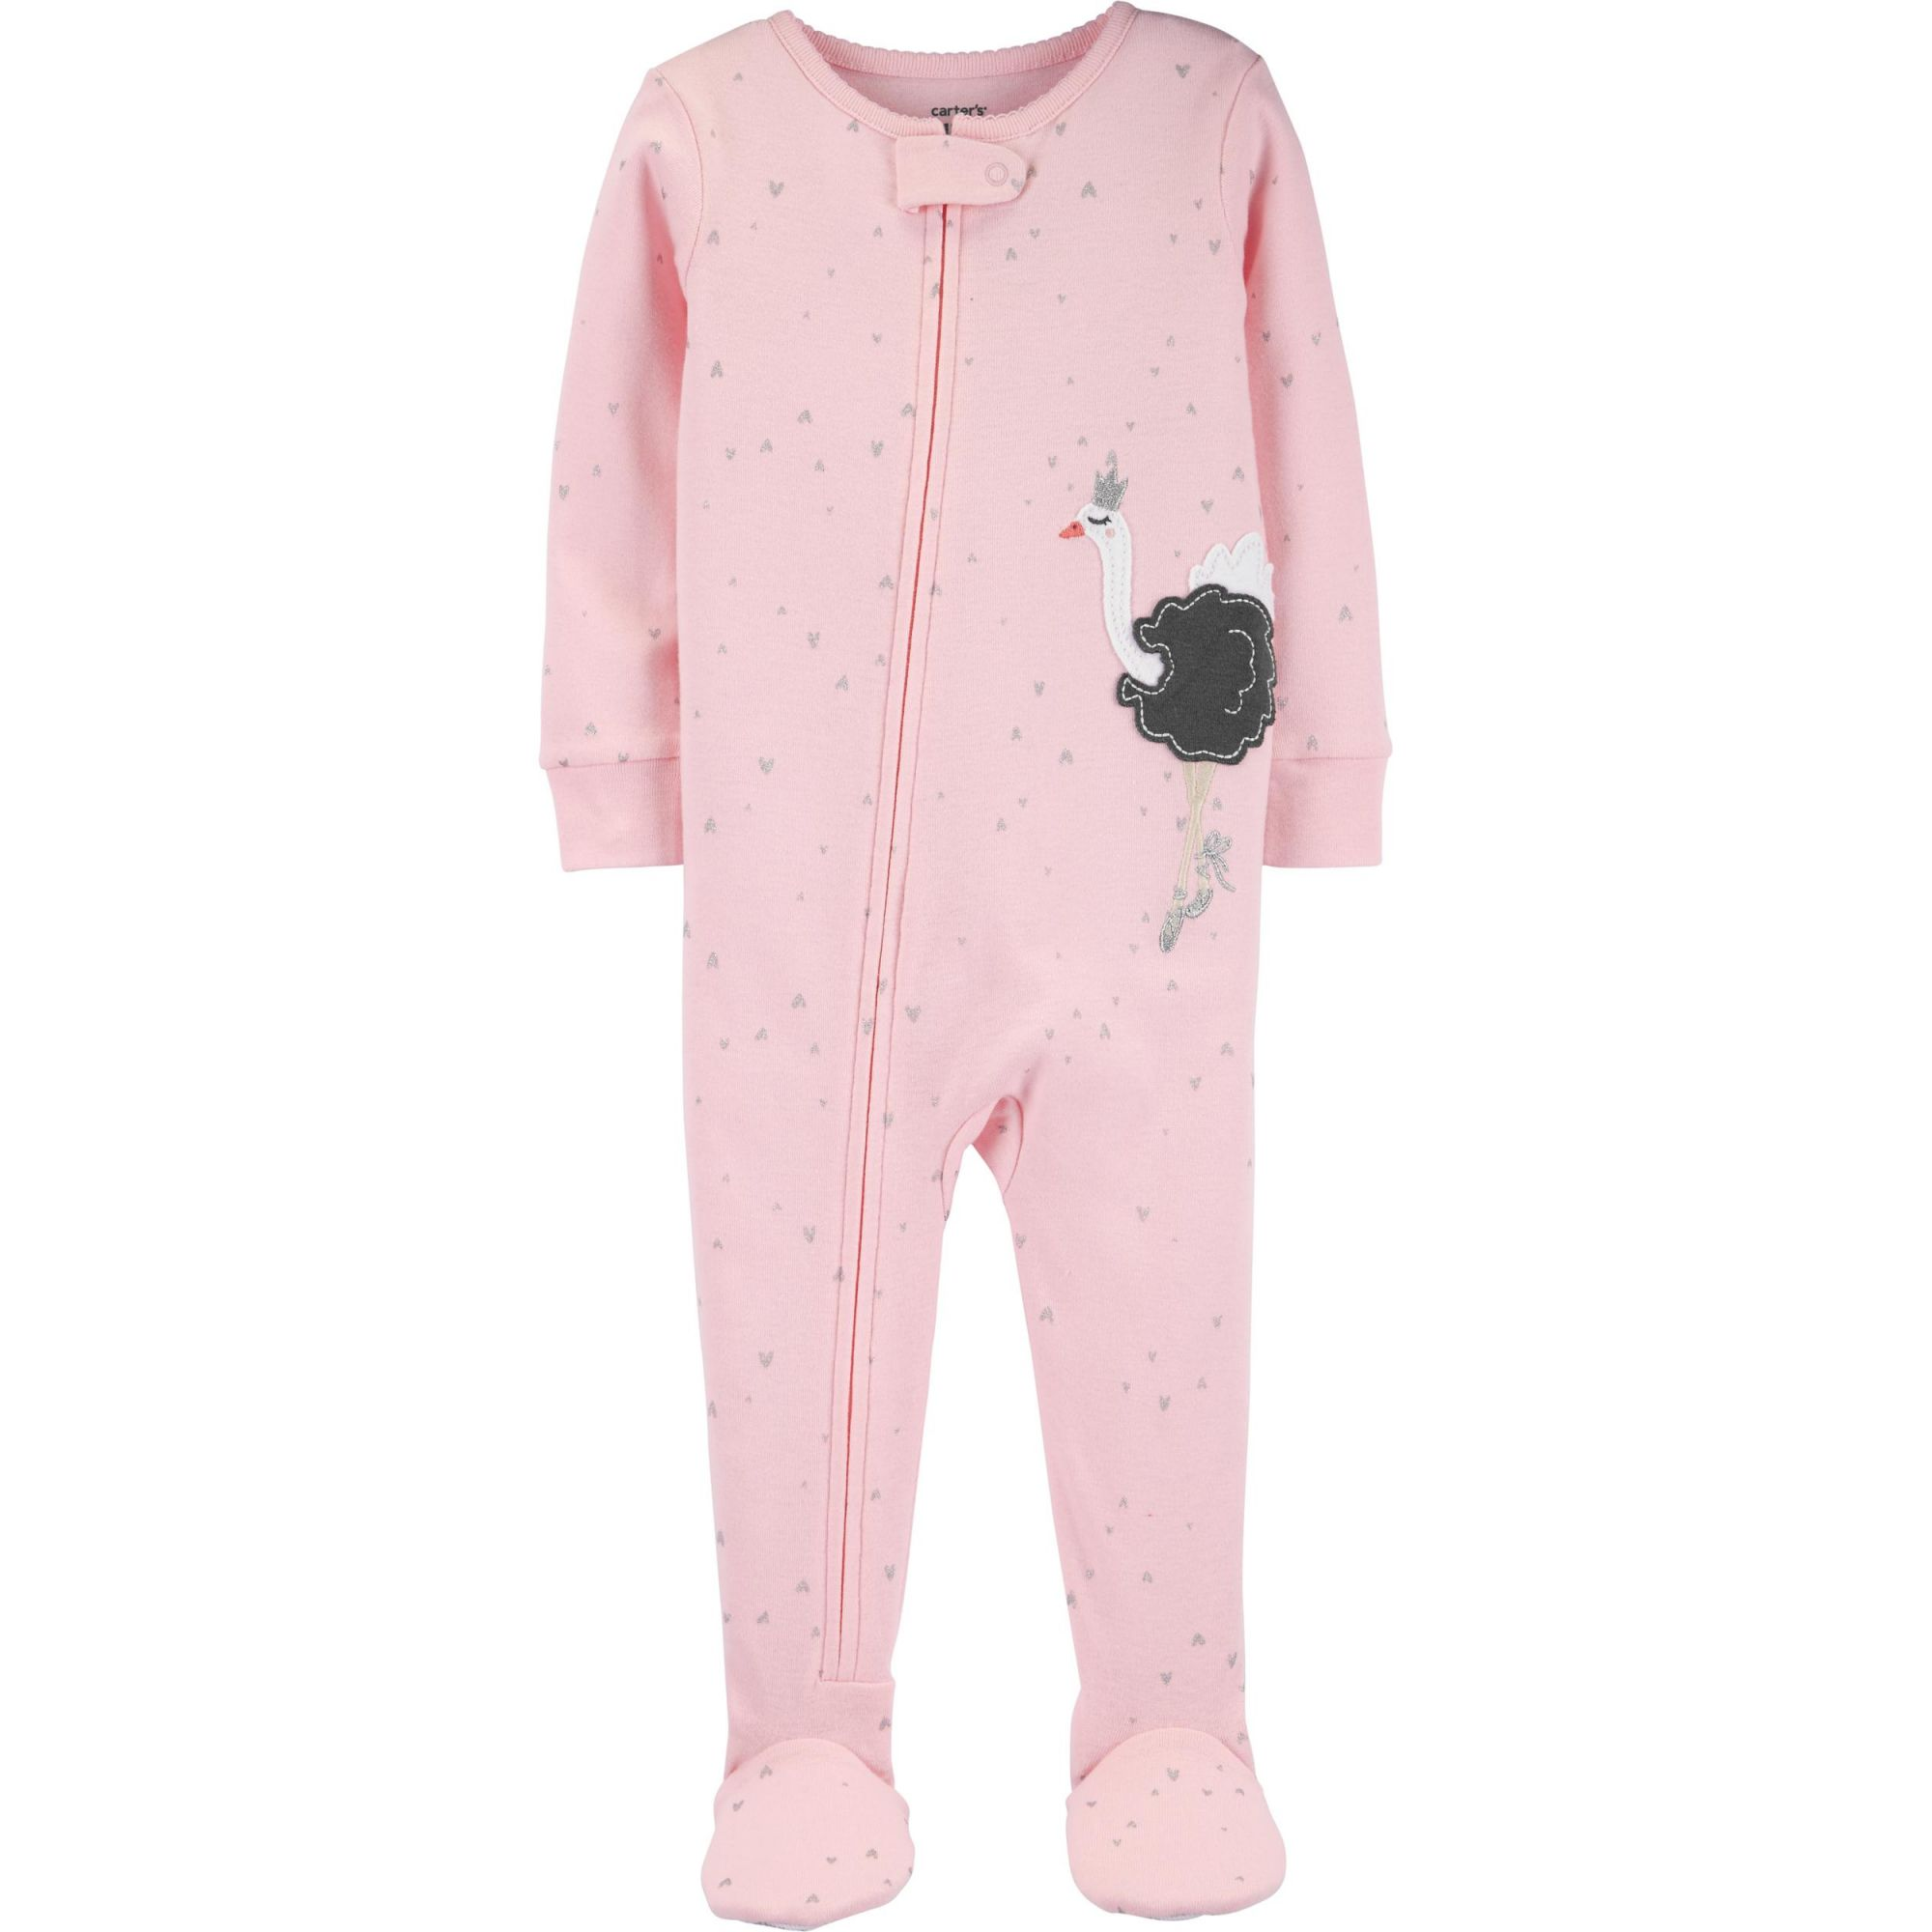 Pijama macacão de malha cisne bailarina - Carters  - Kaiuru Kids